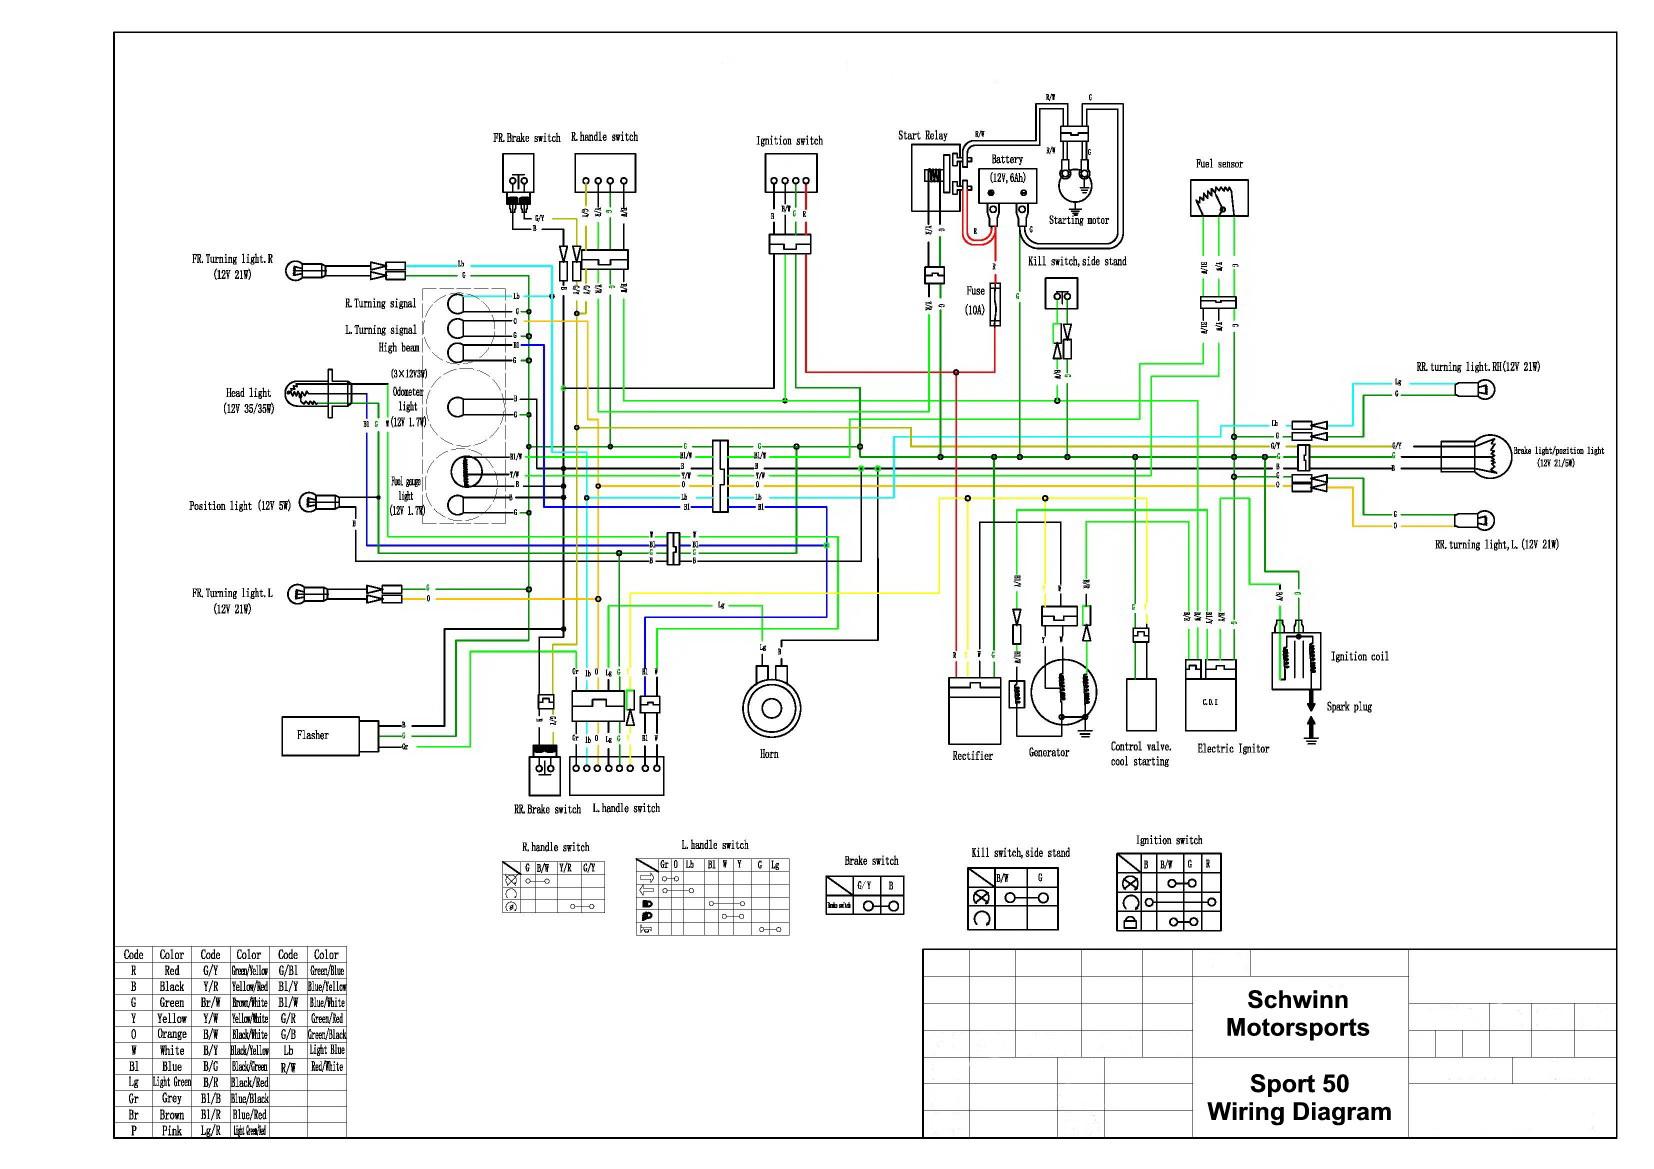 [SCHEMATICS_49CH]  Lark Scooters Wire Diagram - lair.kobe.seblock.de | Lark Scooters Wire Diagram |  | Diagram Source